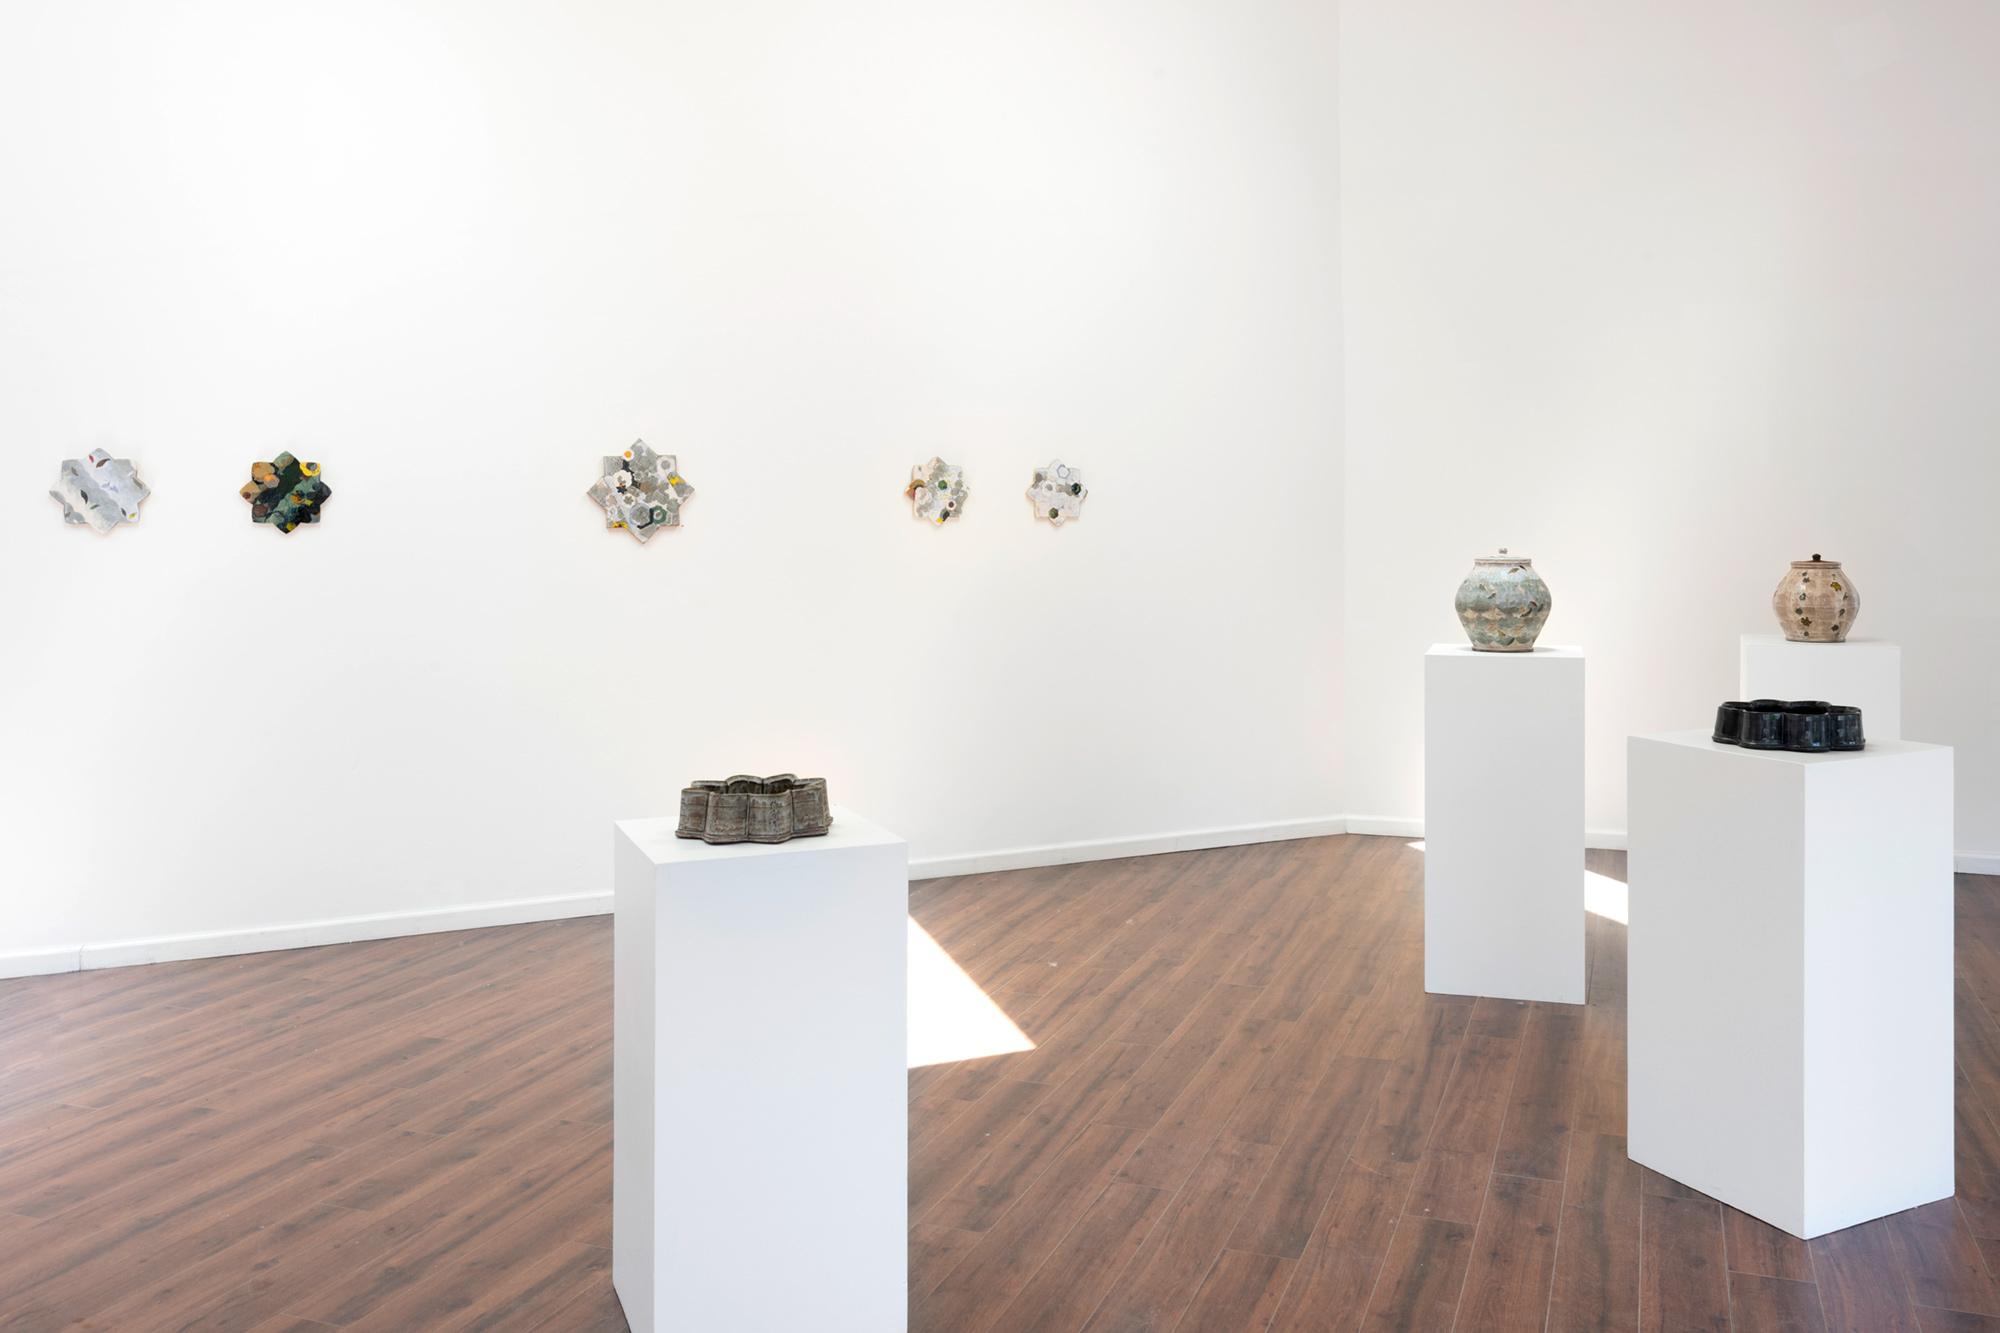 Installation view (Sanam Emami)